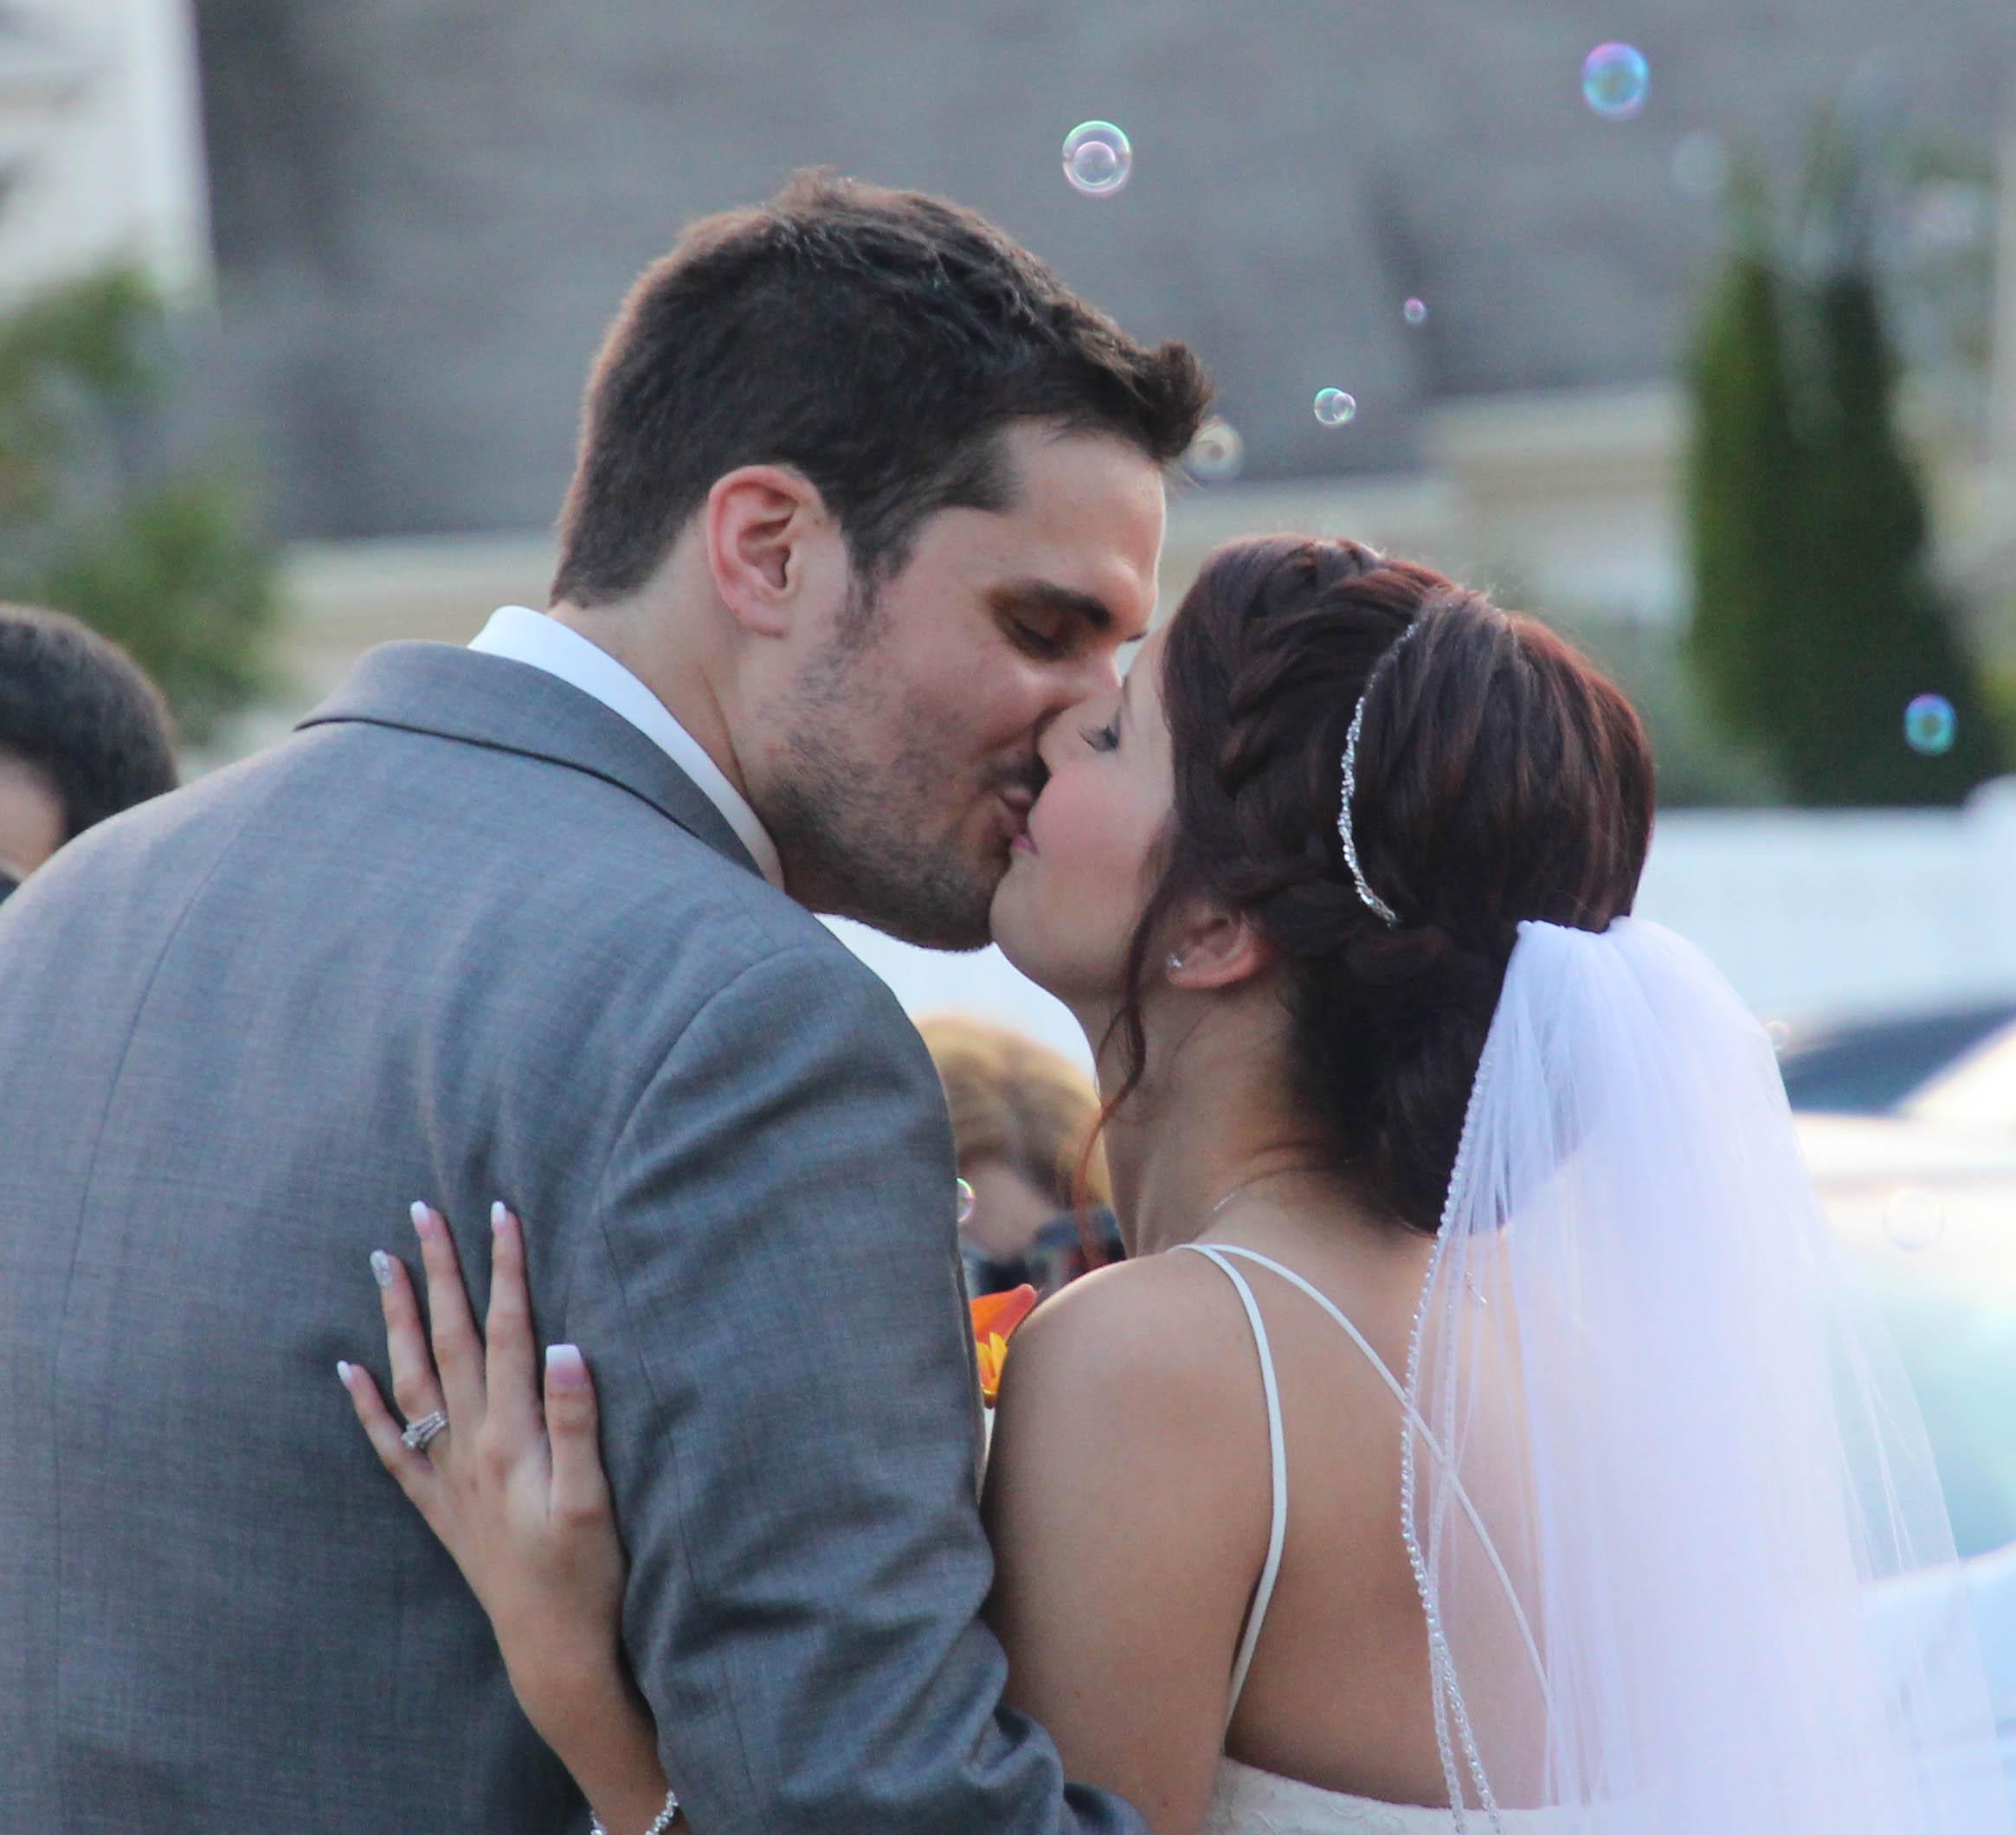 cover kiss.jpg